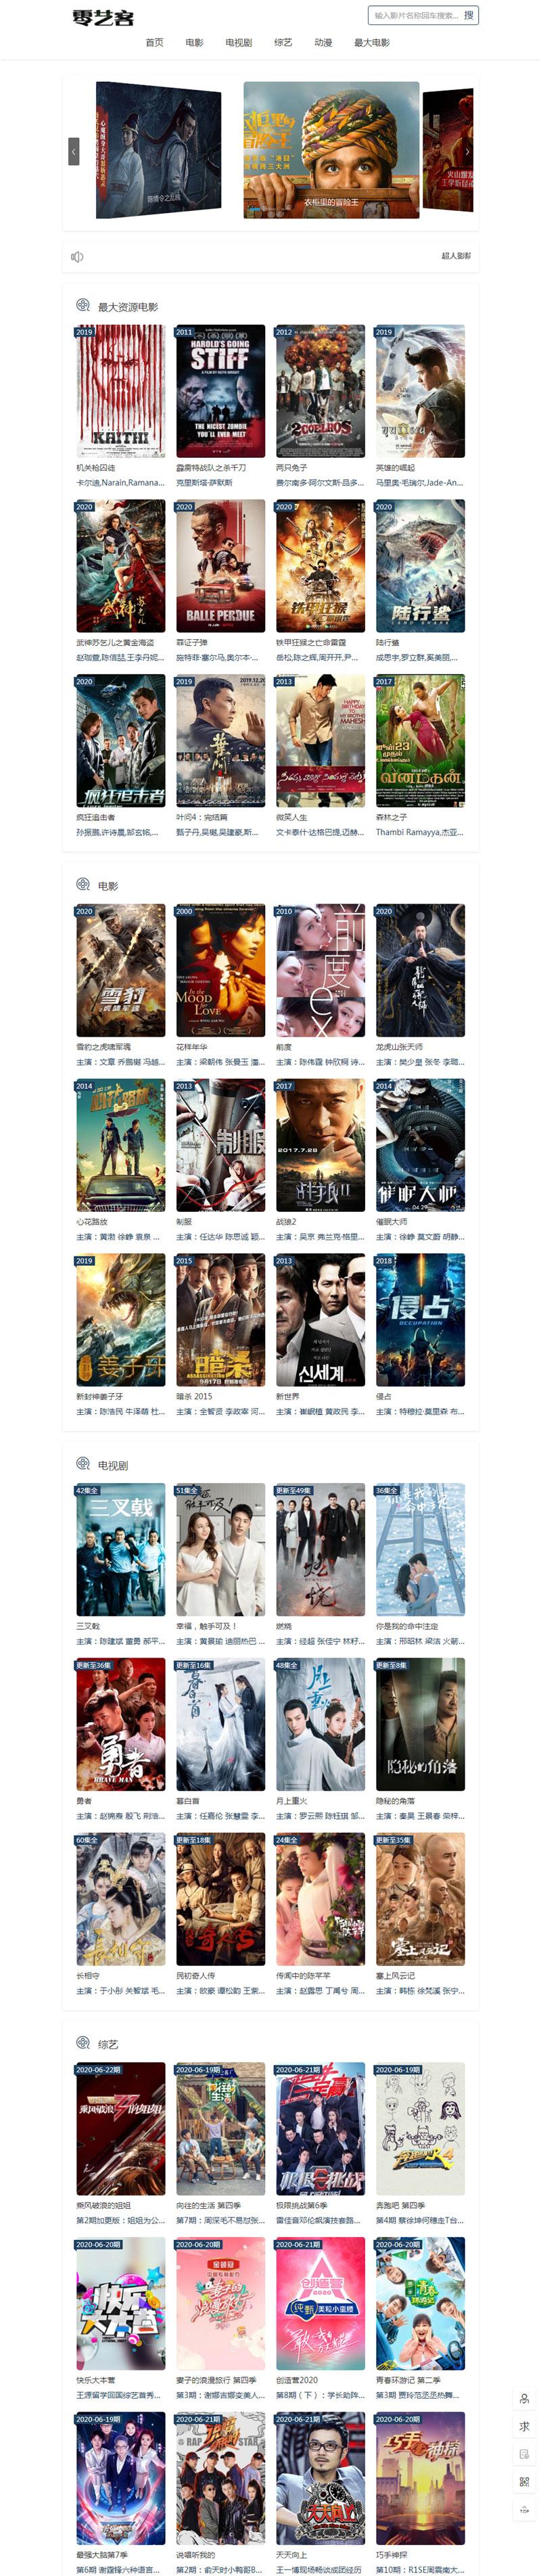 php内核自动采集电影影视网站系统源码